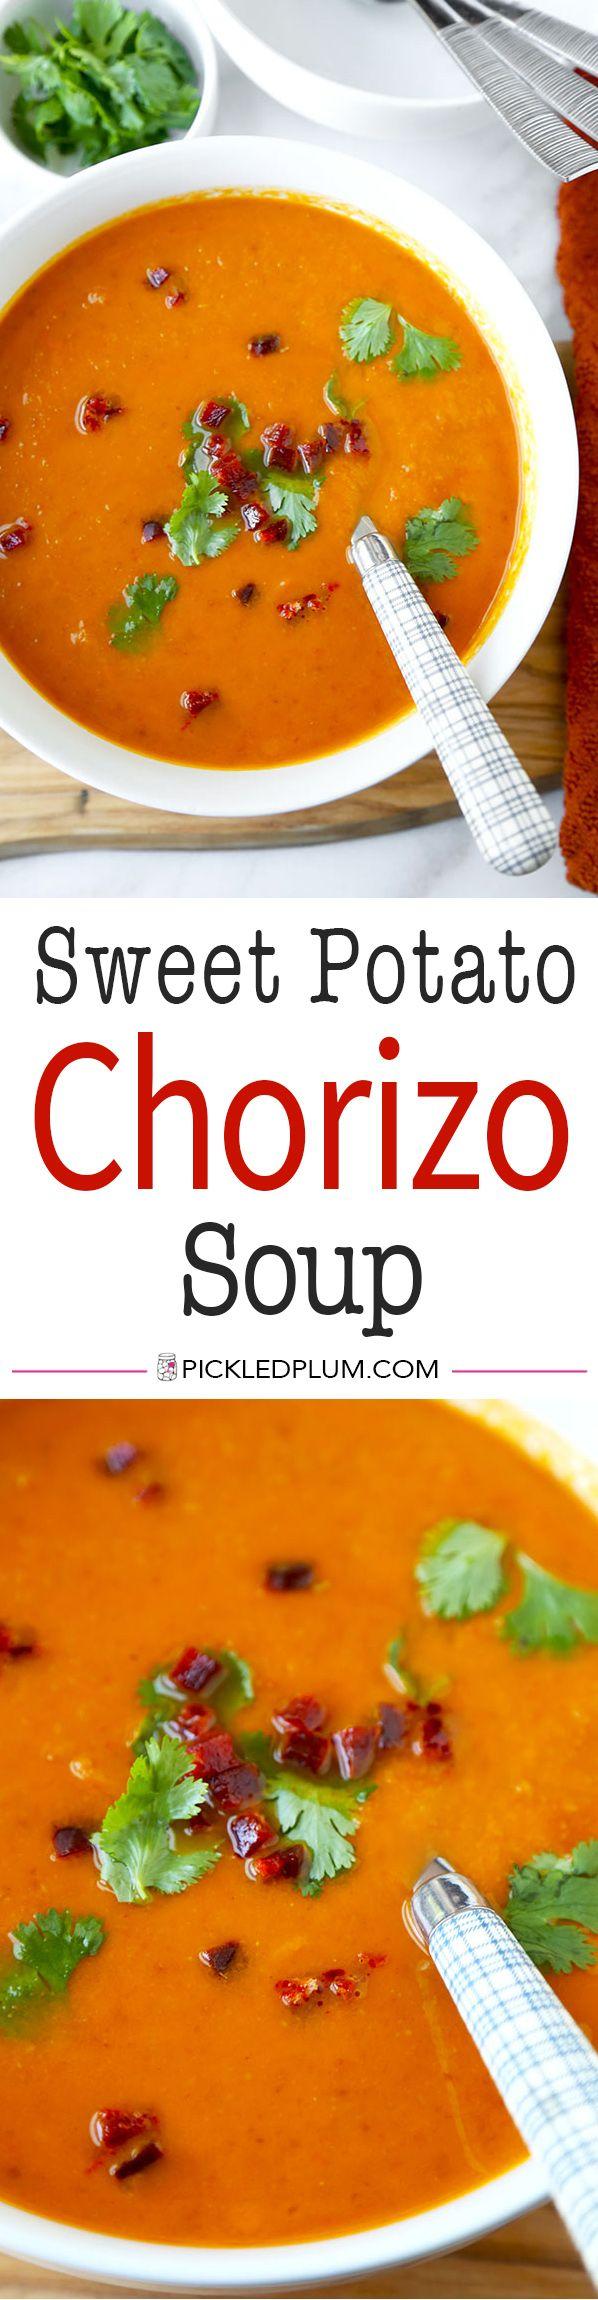 17+ ideas about Chorizo Soup on Pinterest   Chorizo soup ...